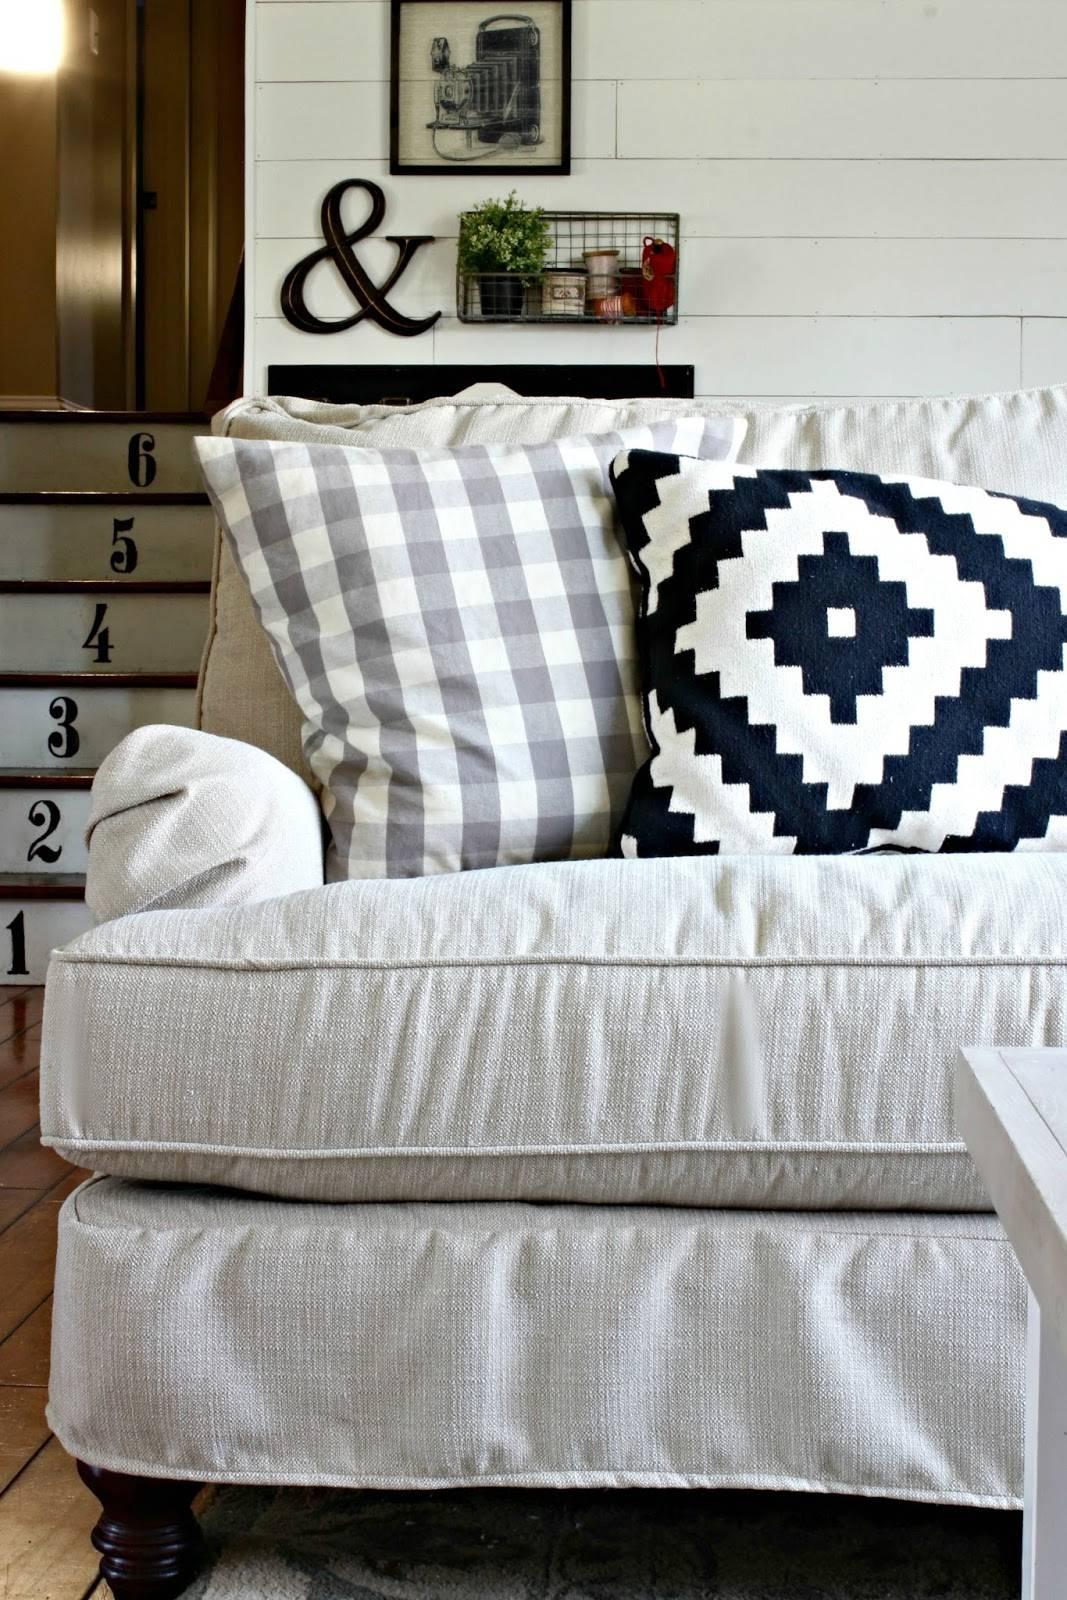 Golden Boys And Me: Our New Sofa {Birch Lane Montgomery regarding Lane Furniture Sofas (Image 10 of 25)